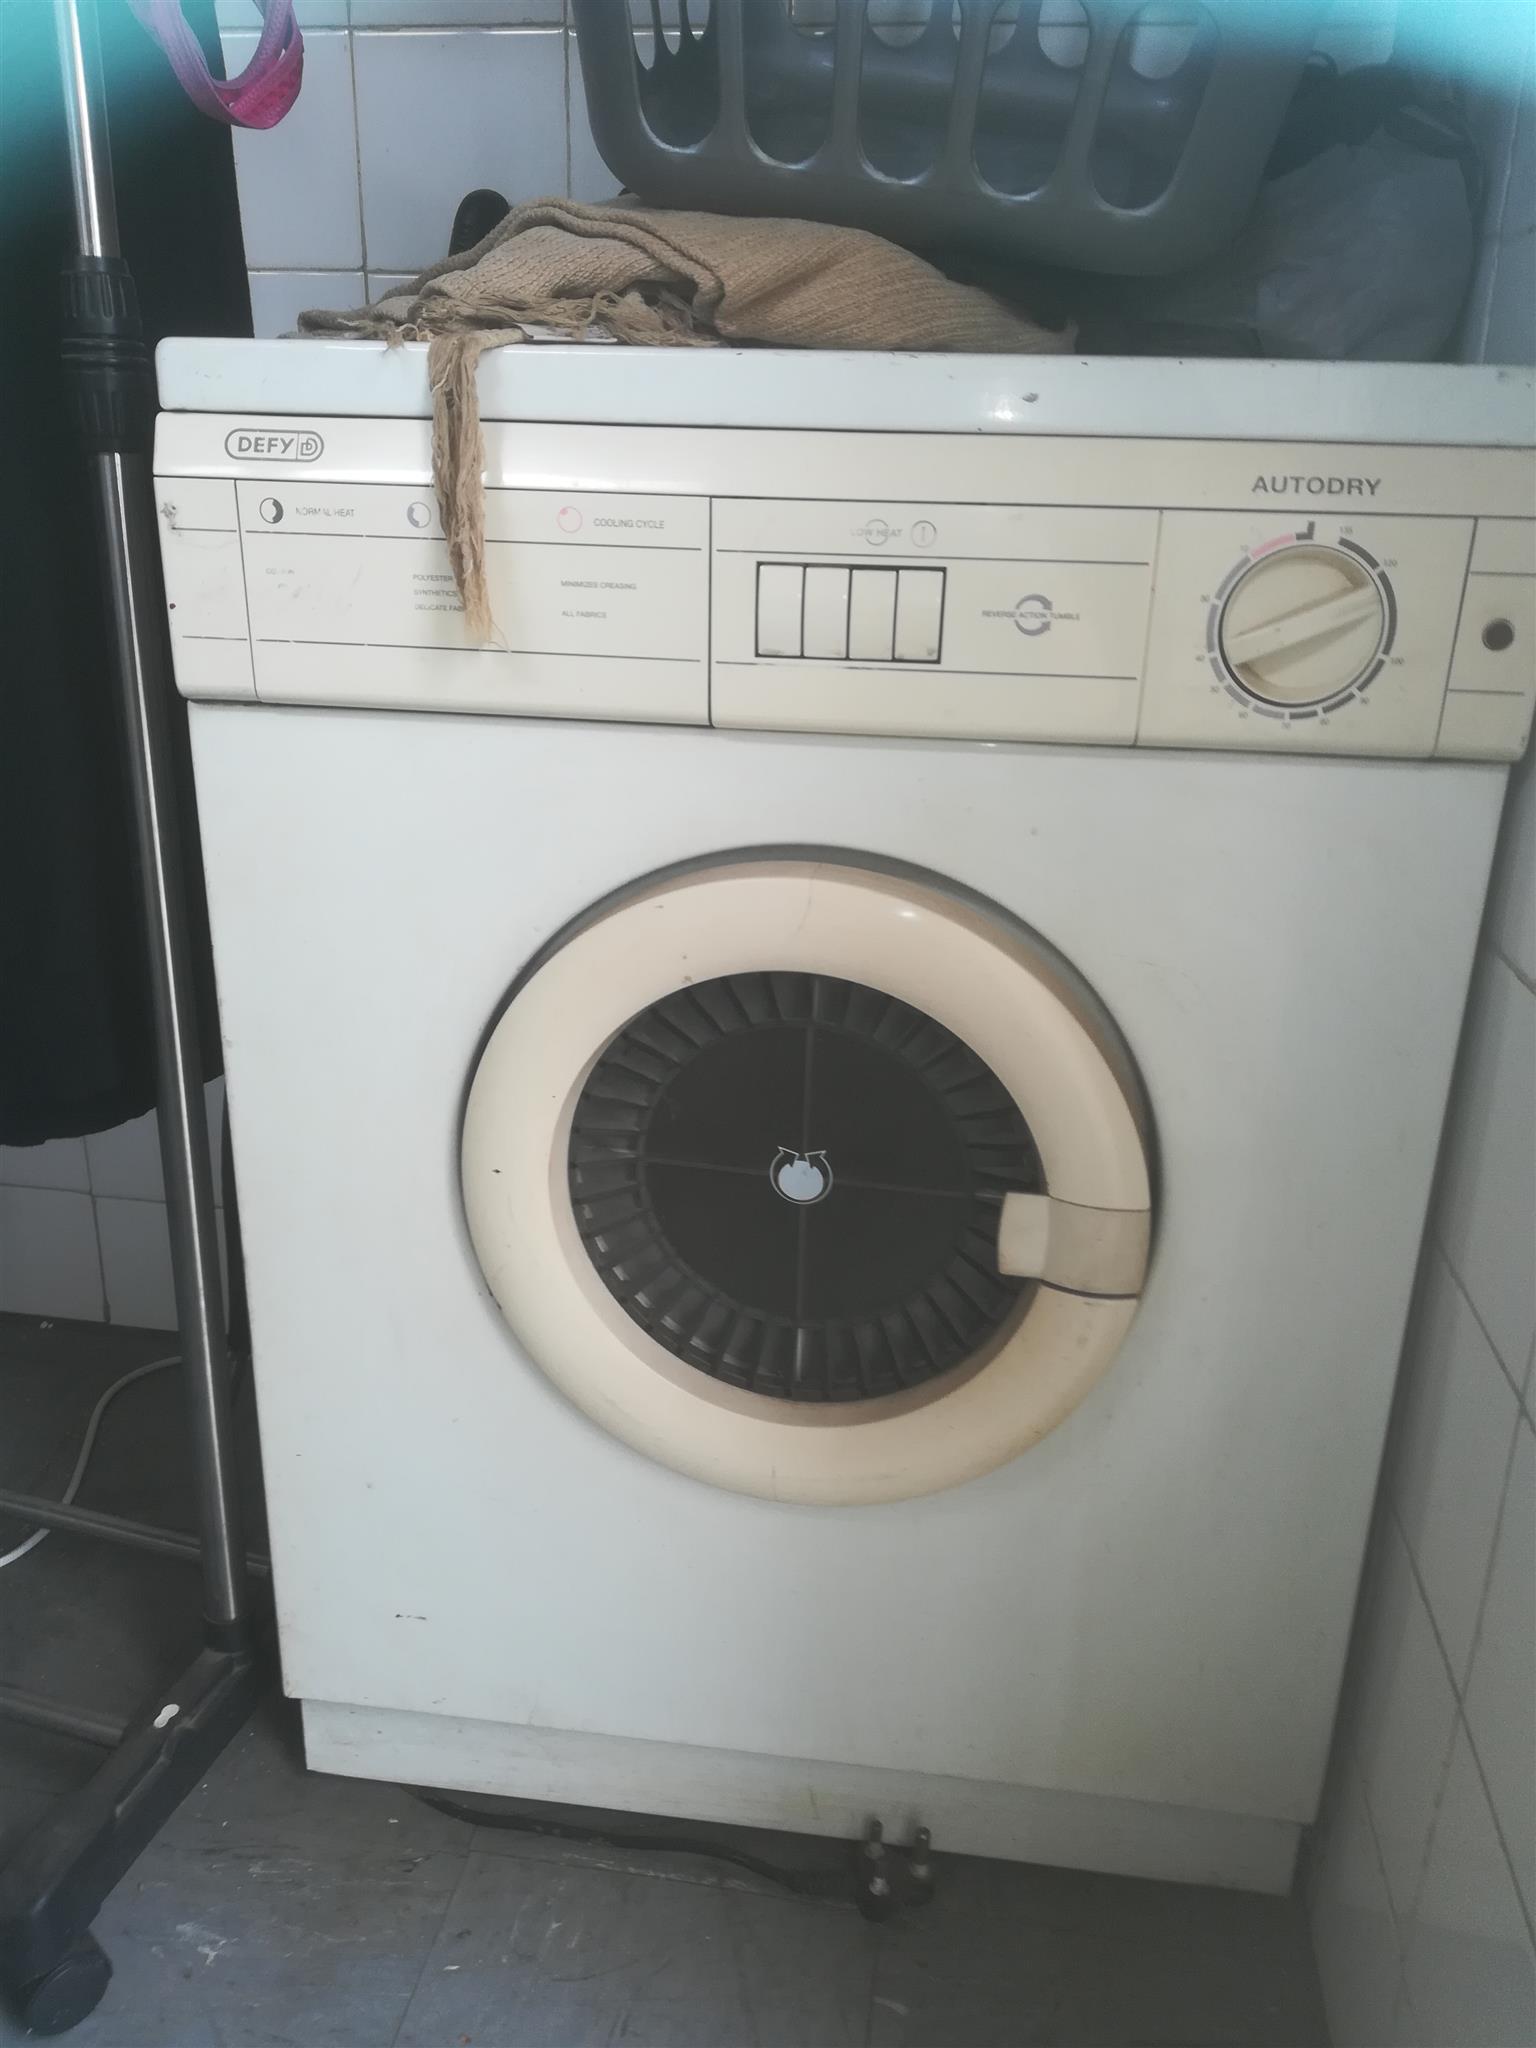 Defy tumble drier needs repairs